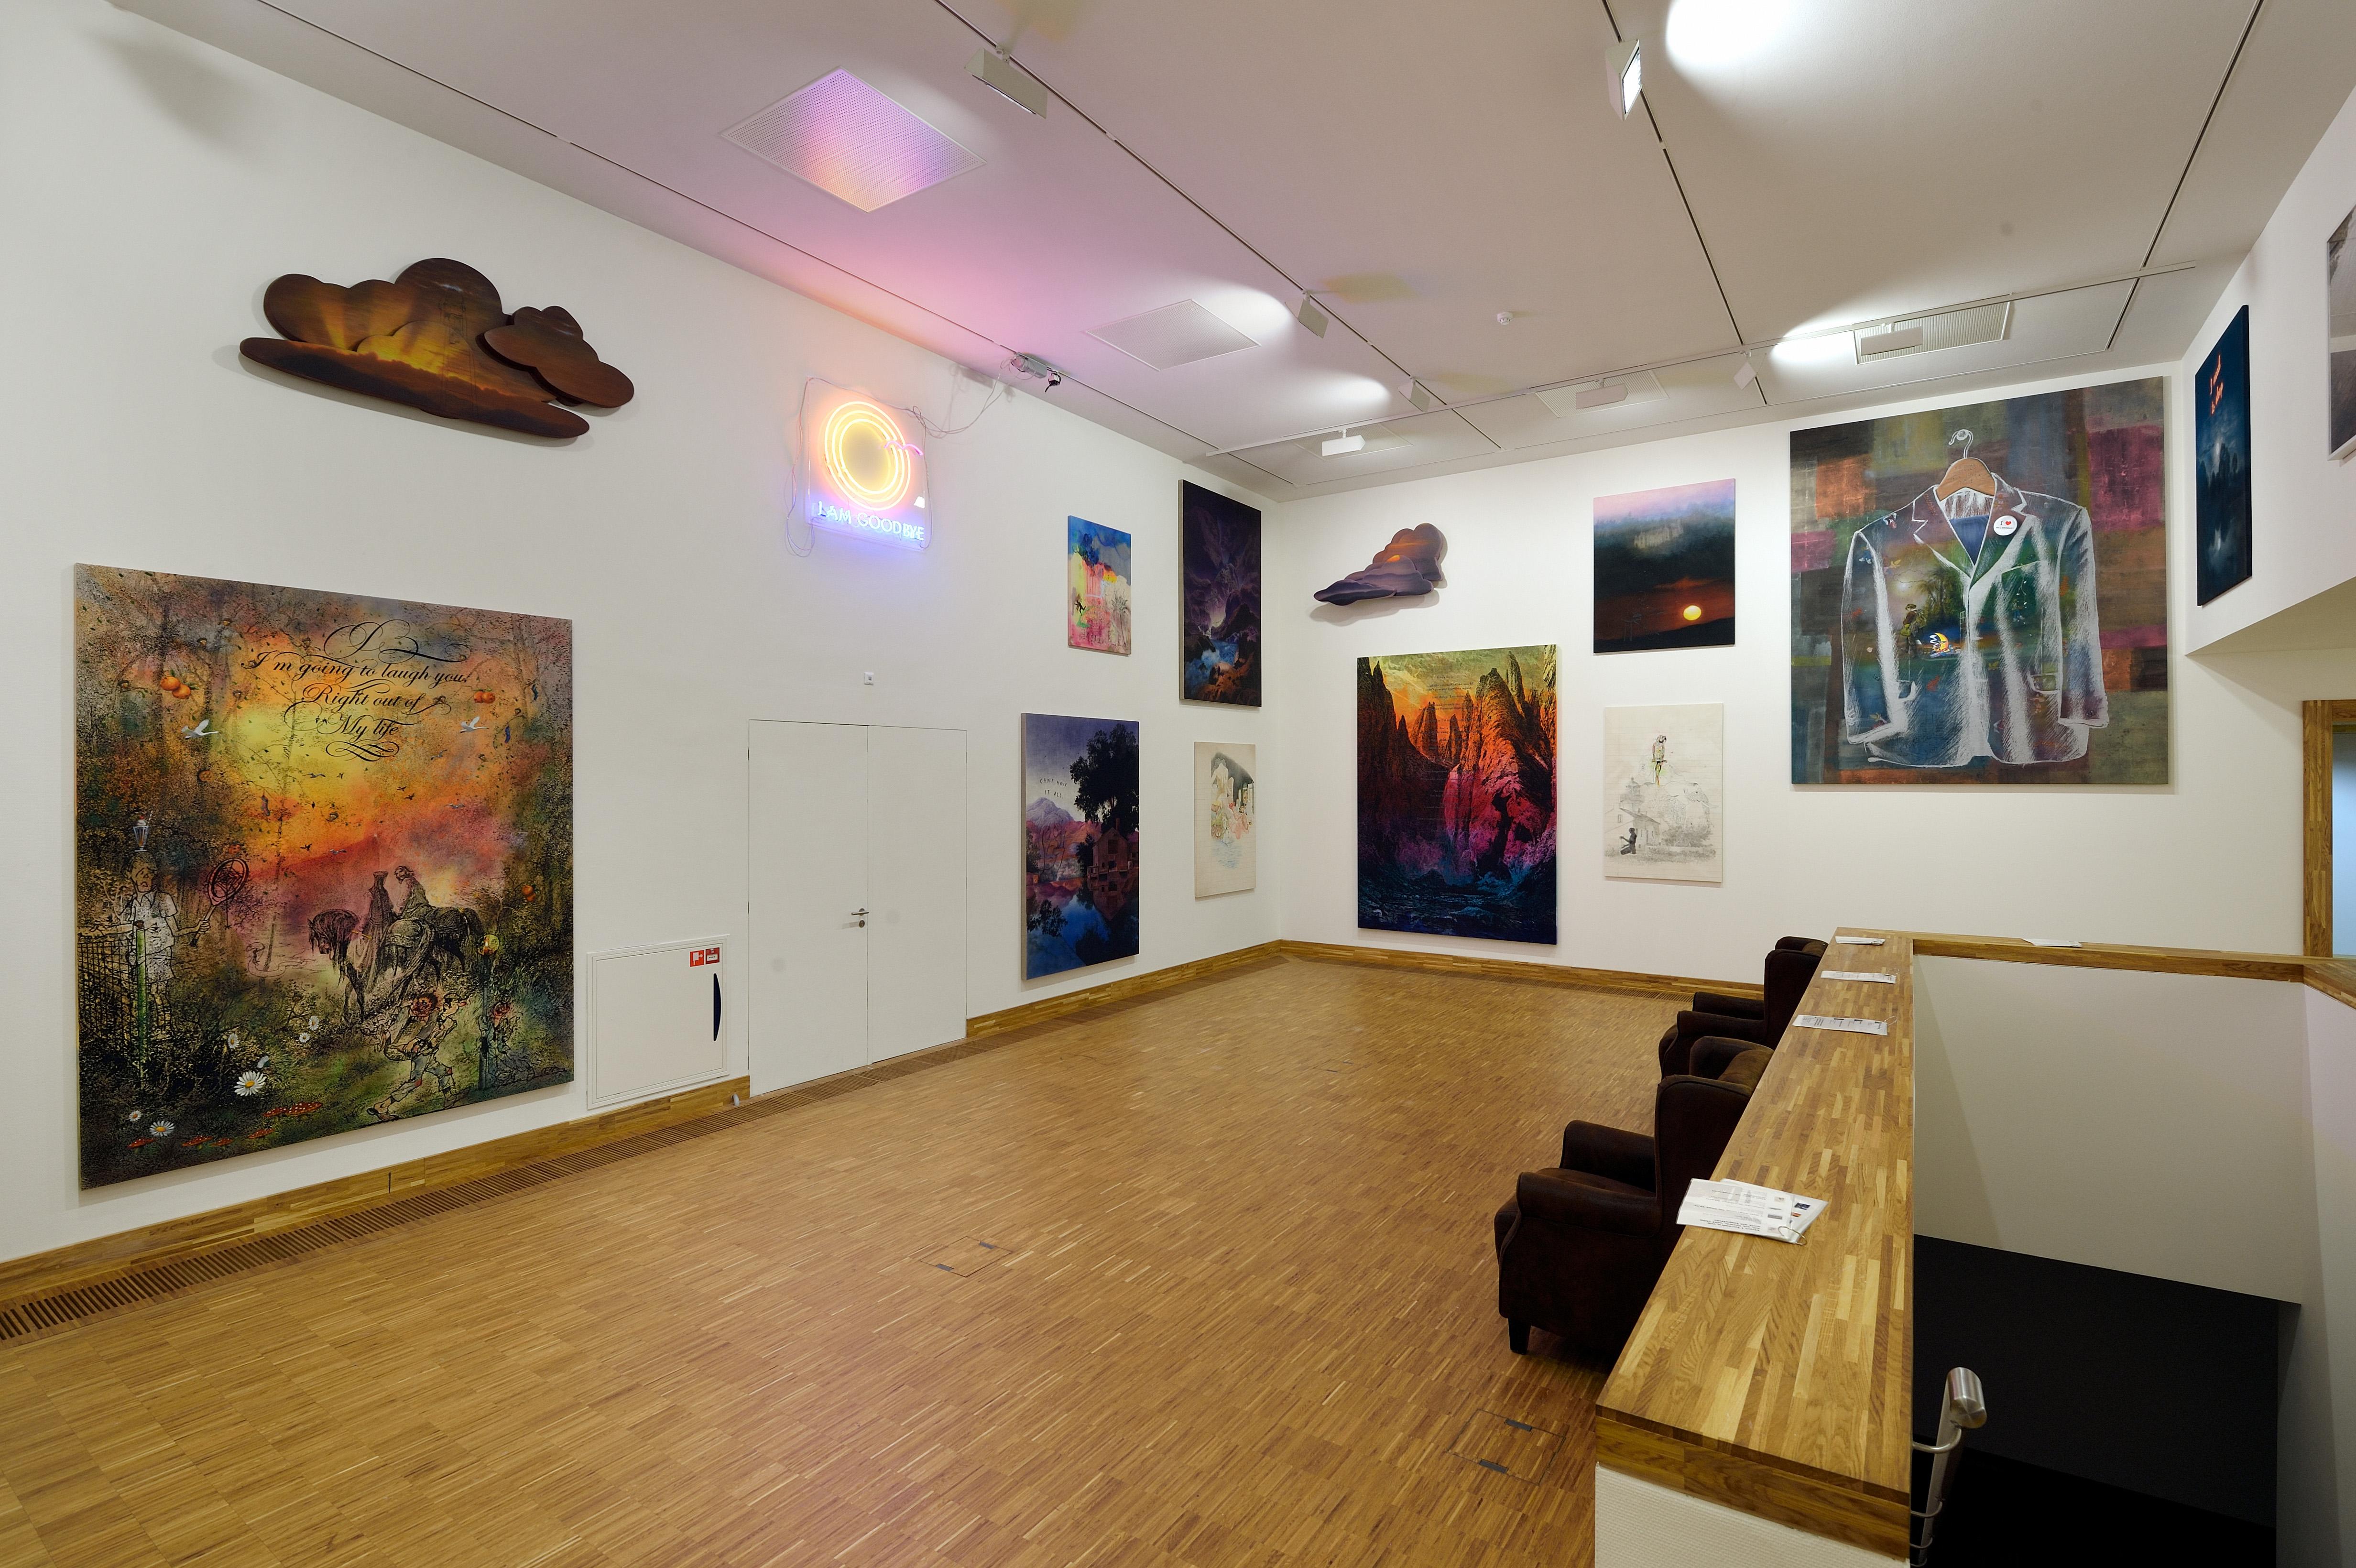 Zaaloverzicht Self-Fiction met werk van Friedrich Kunath